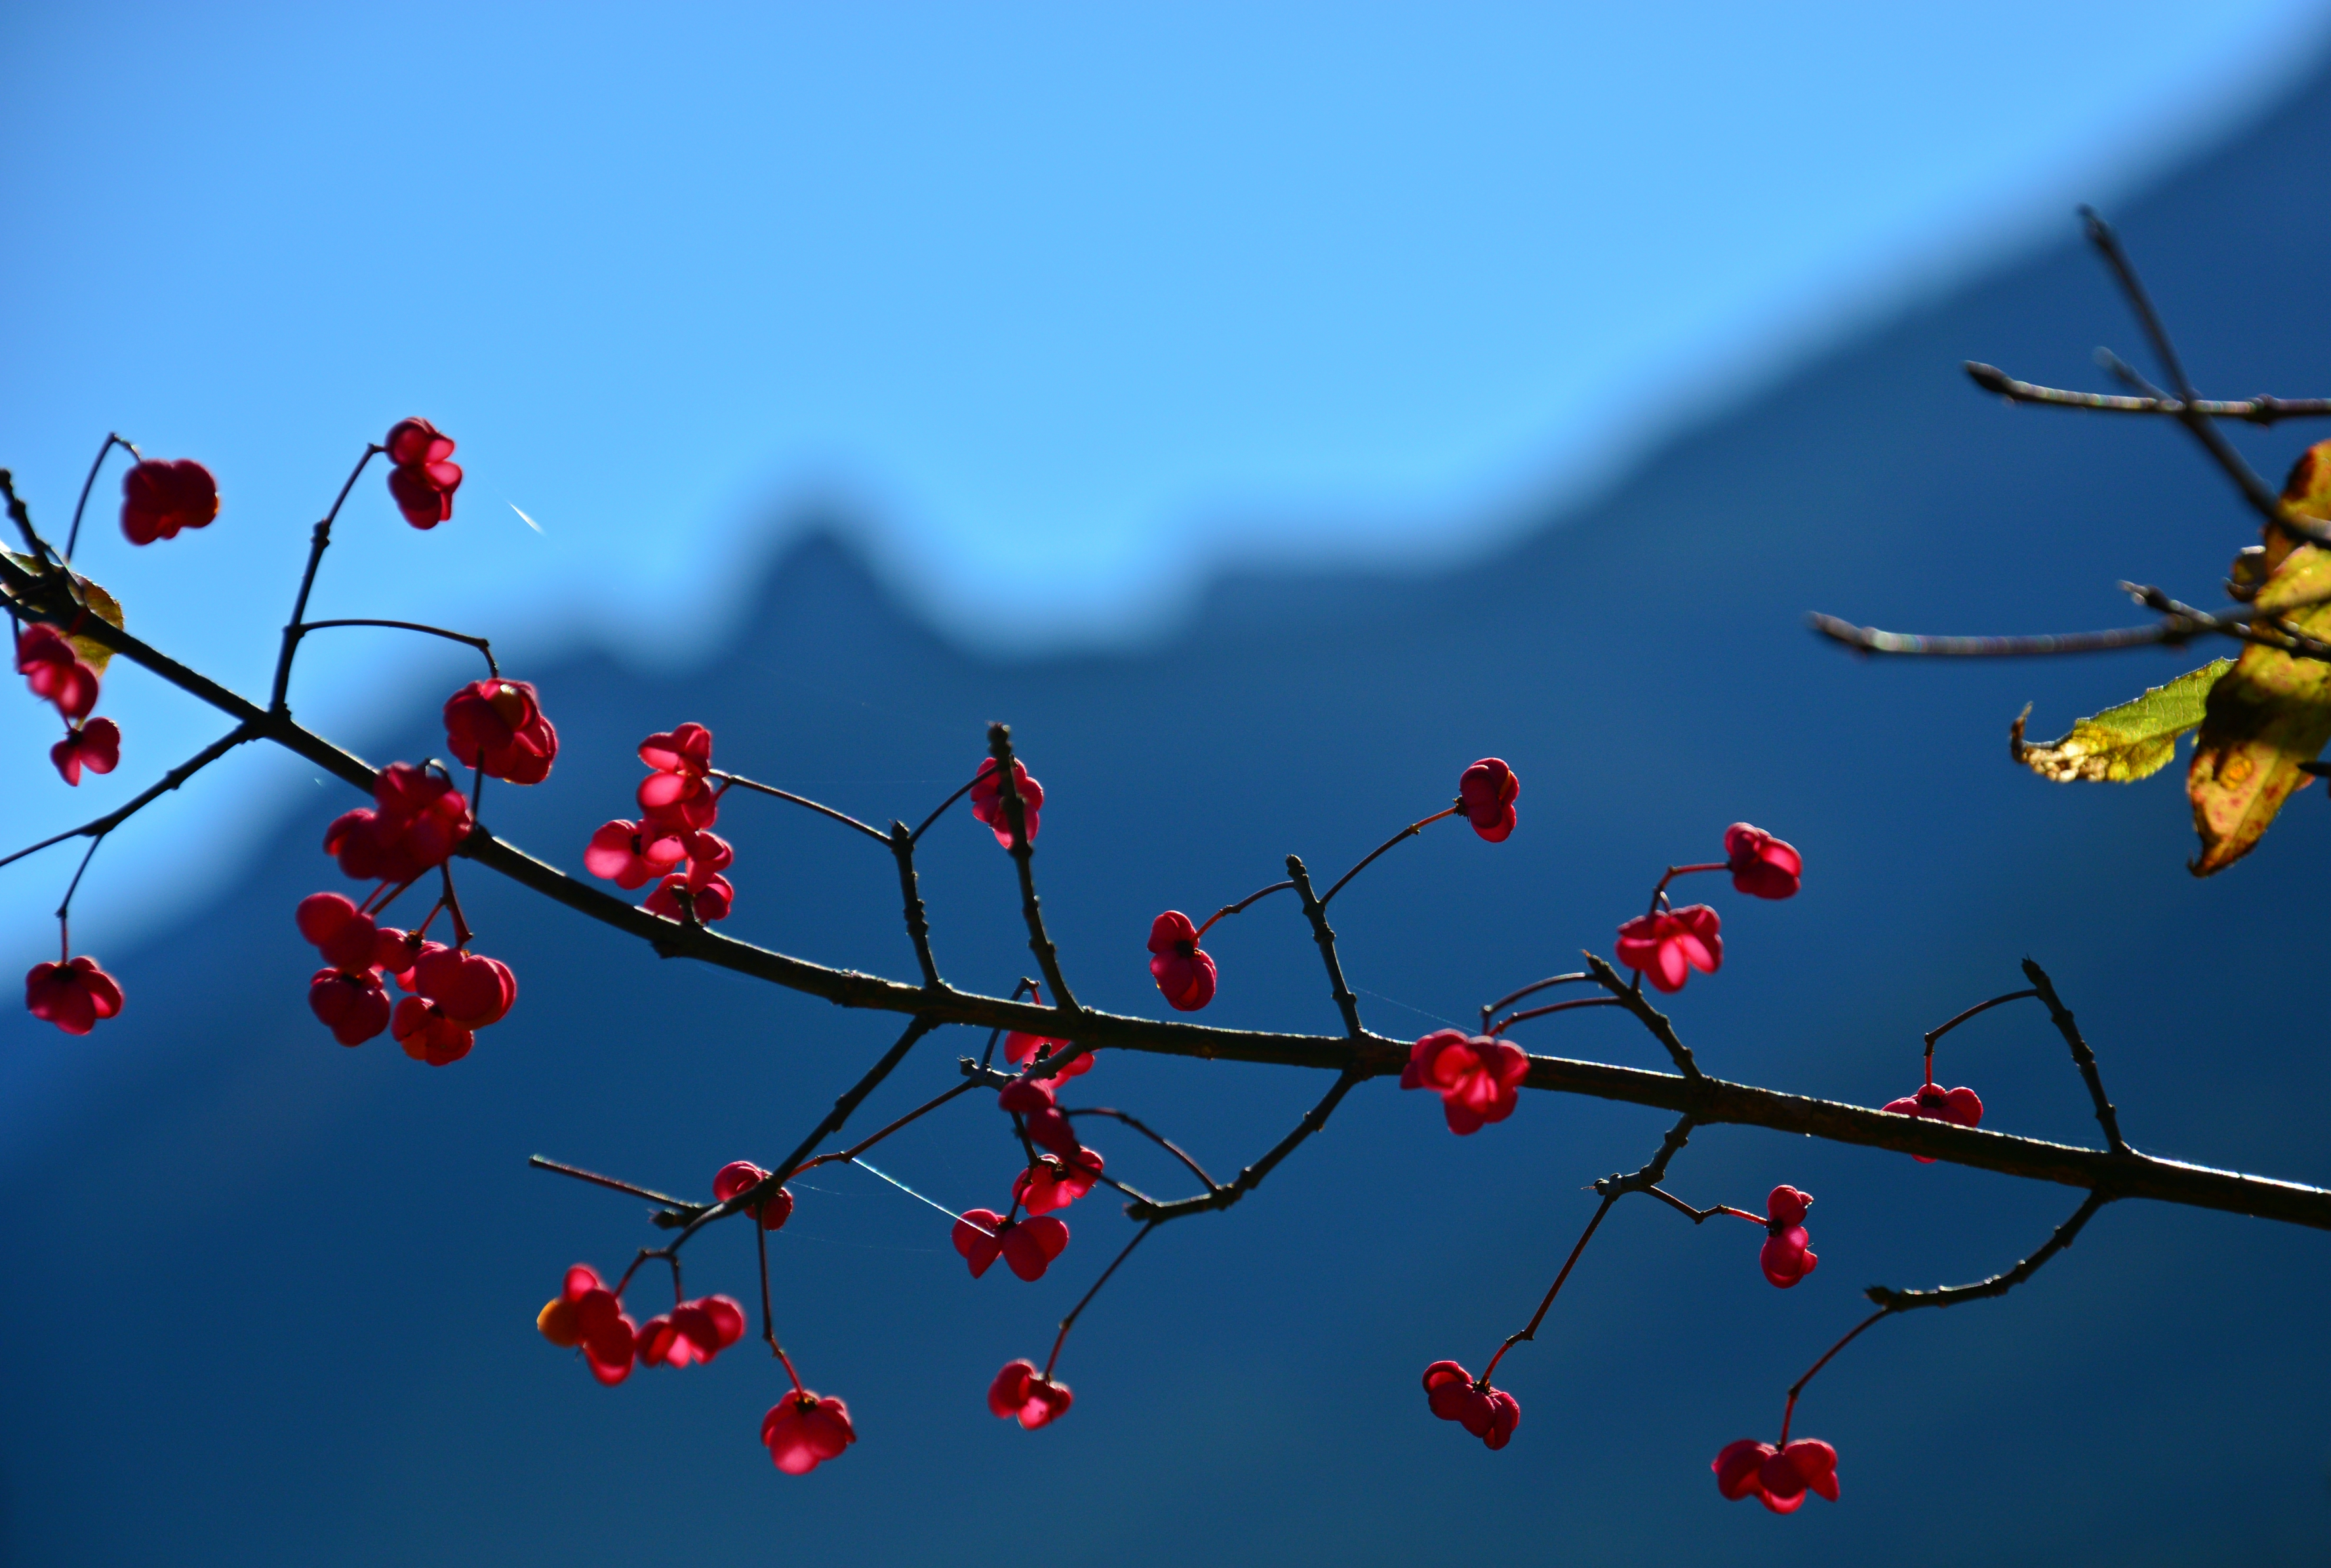 H0147 Herbstzauber vor der Bergkette.jpg